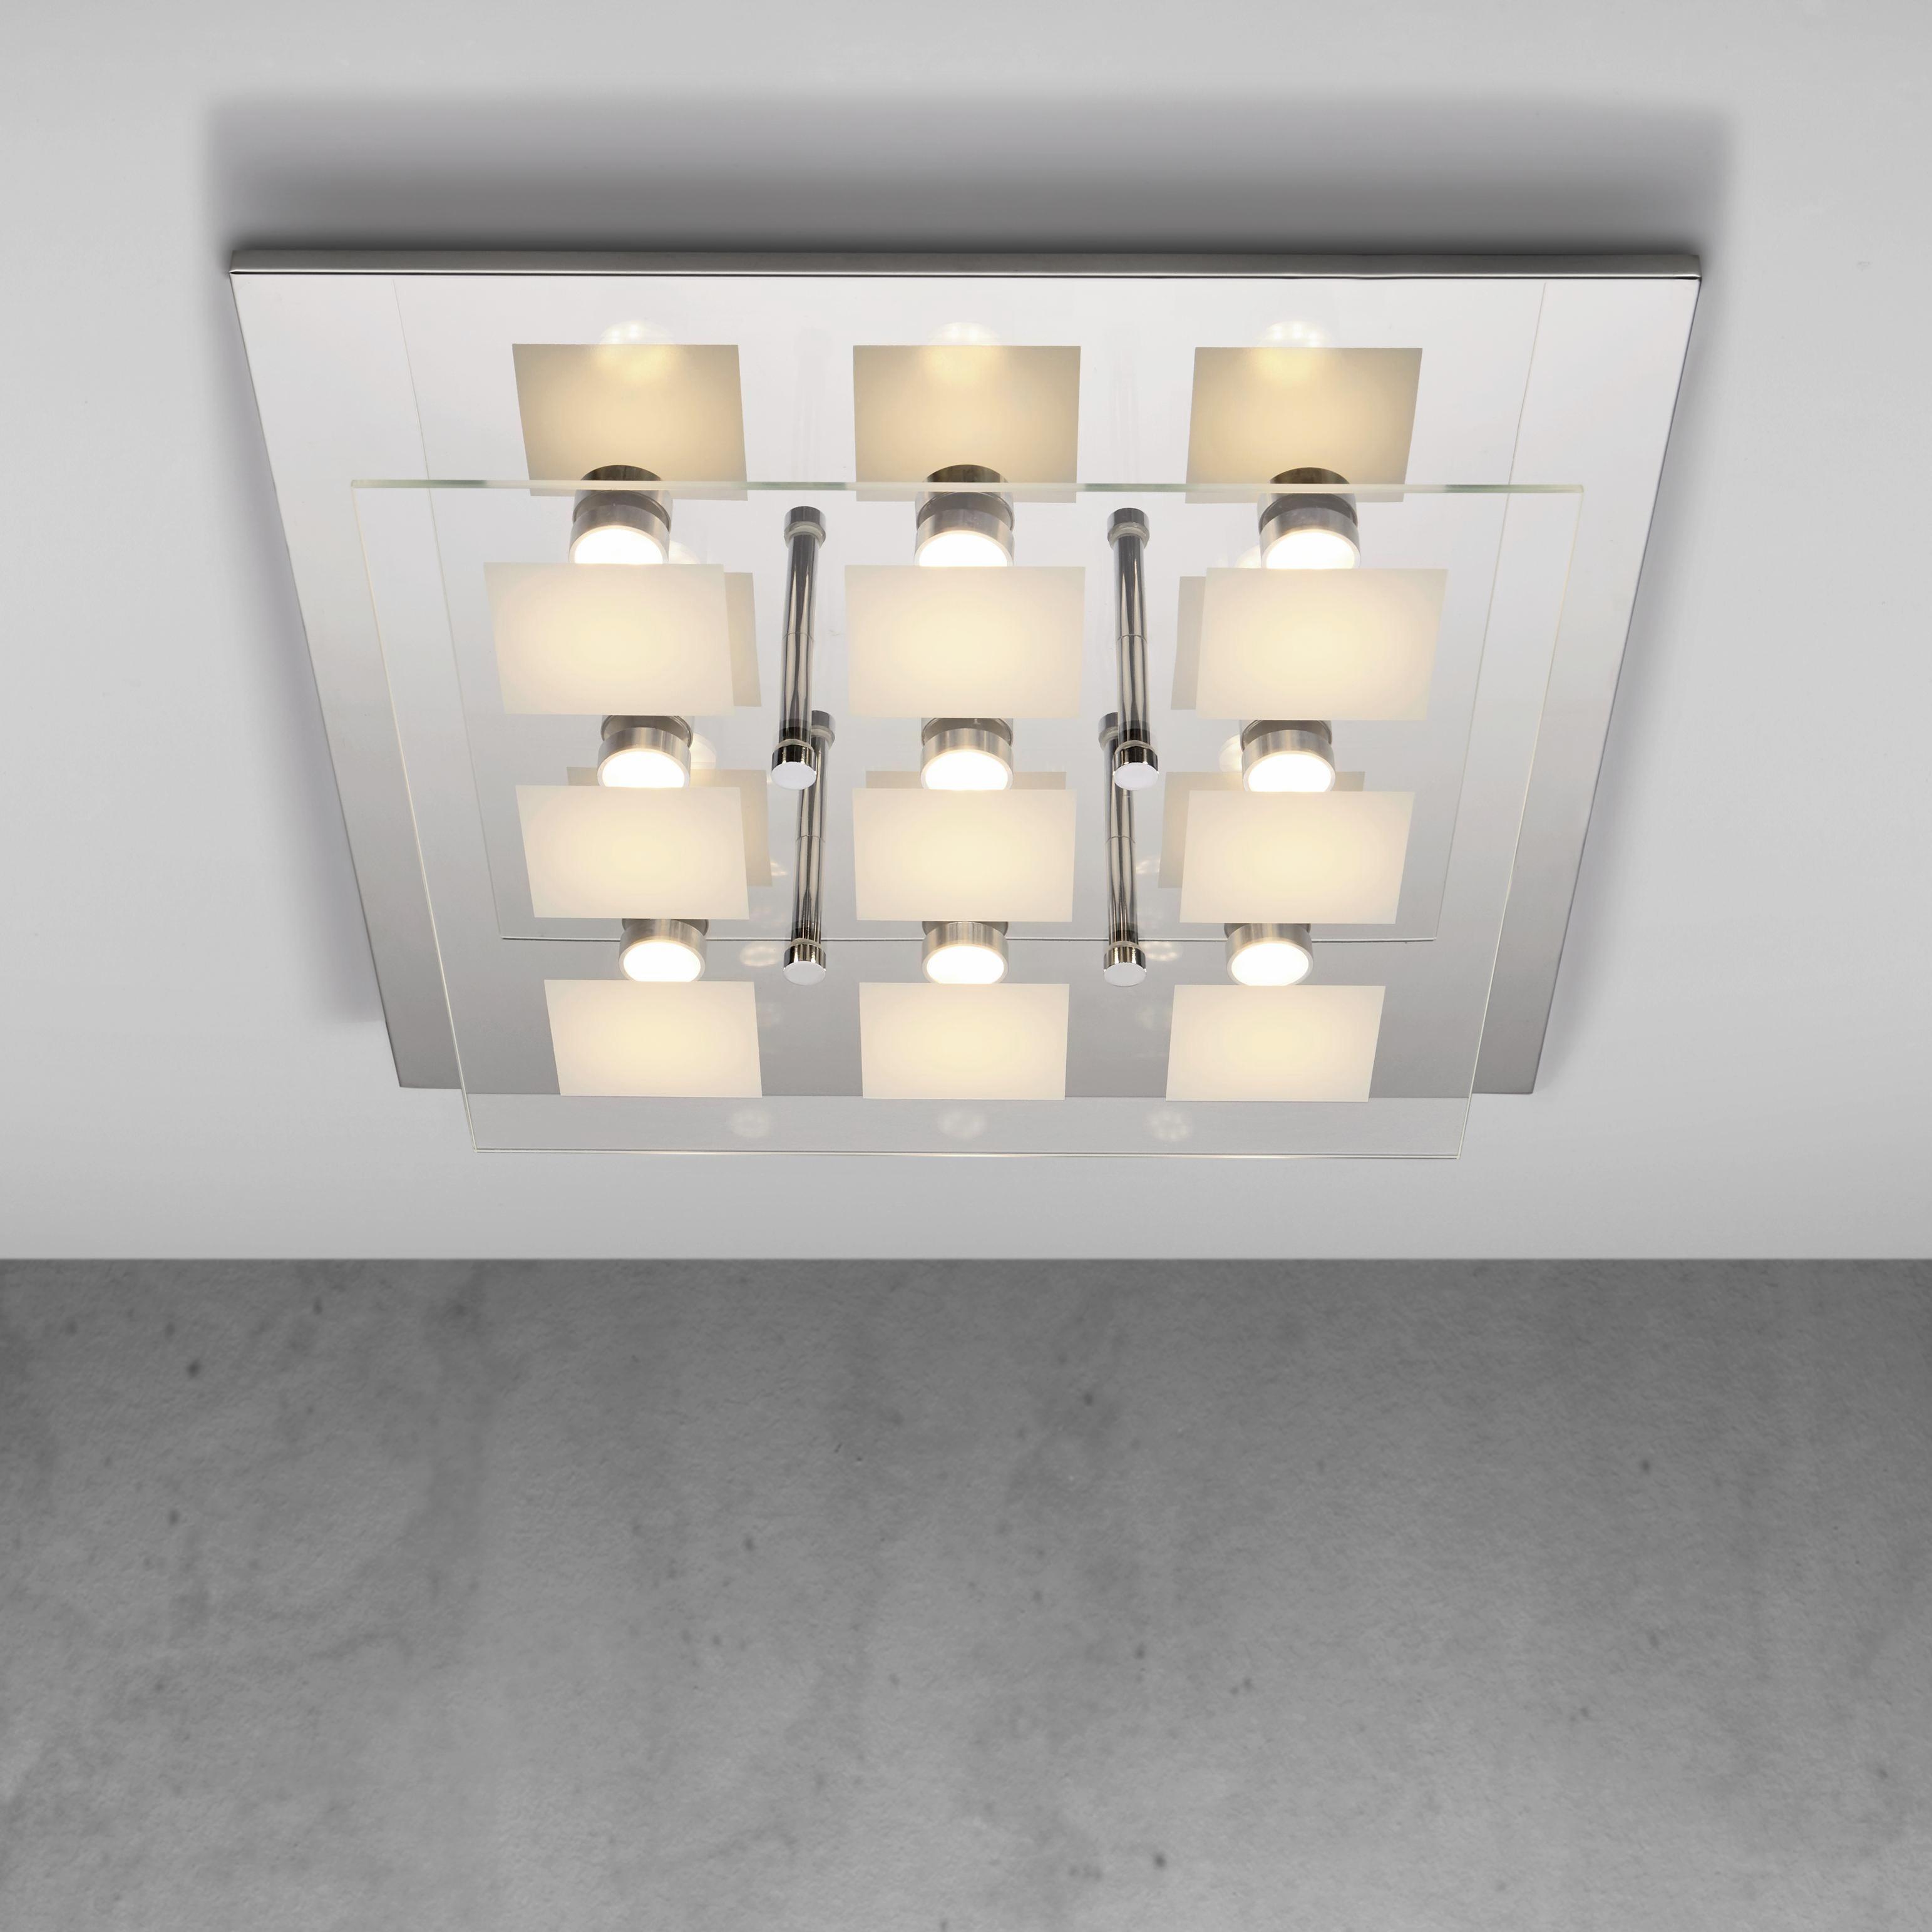 LED-Deckenleuchte Louna - Chromfarben, MODERN, Glas/Kunststoff (48/8cm) - MÖMAX modern living